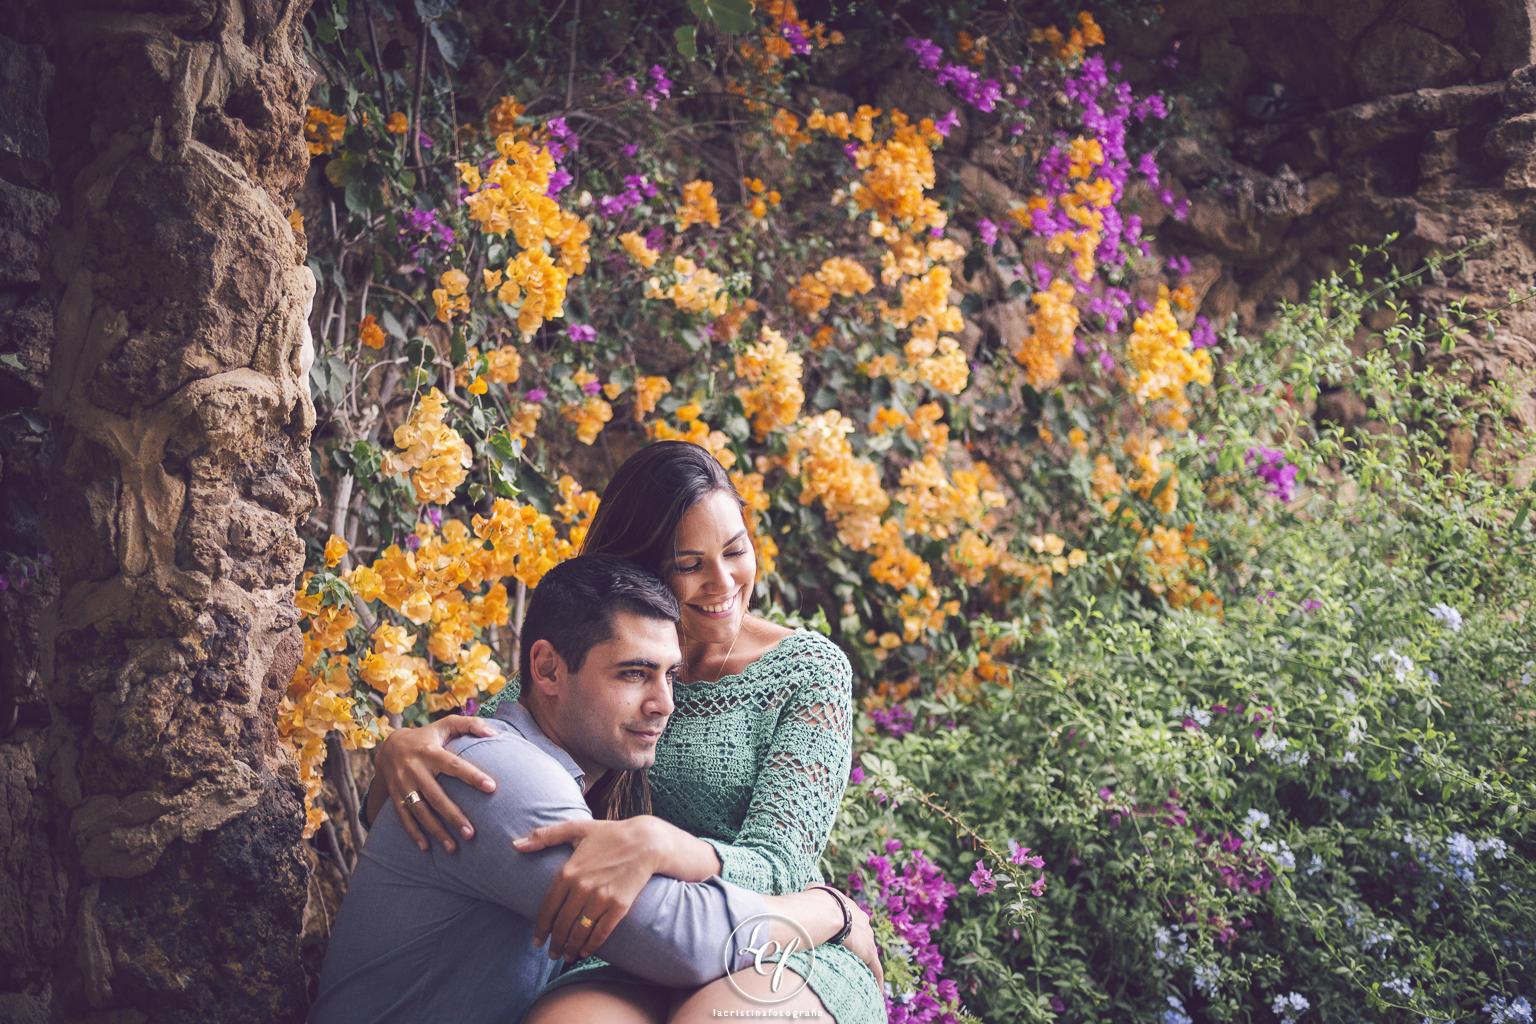 Fotógrafo de boda :: Fotografía de preboda :: Reportaje Preboda Barcelona